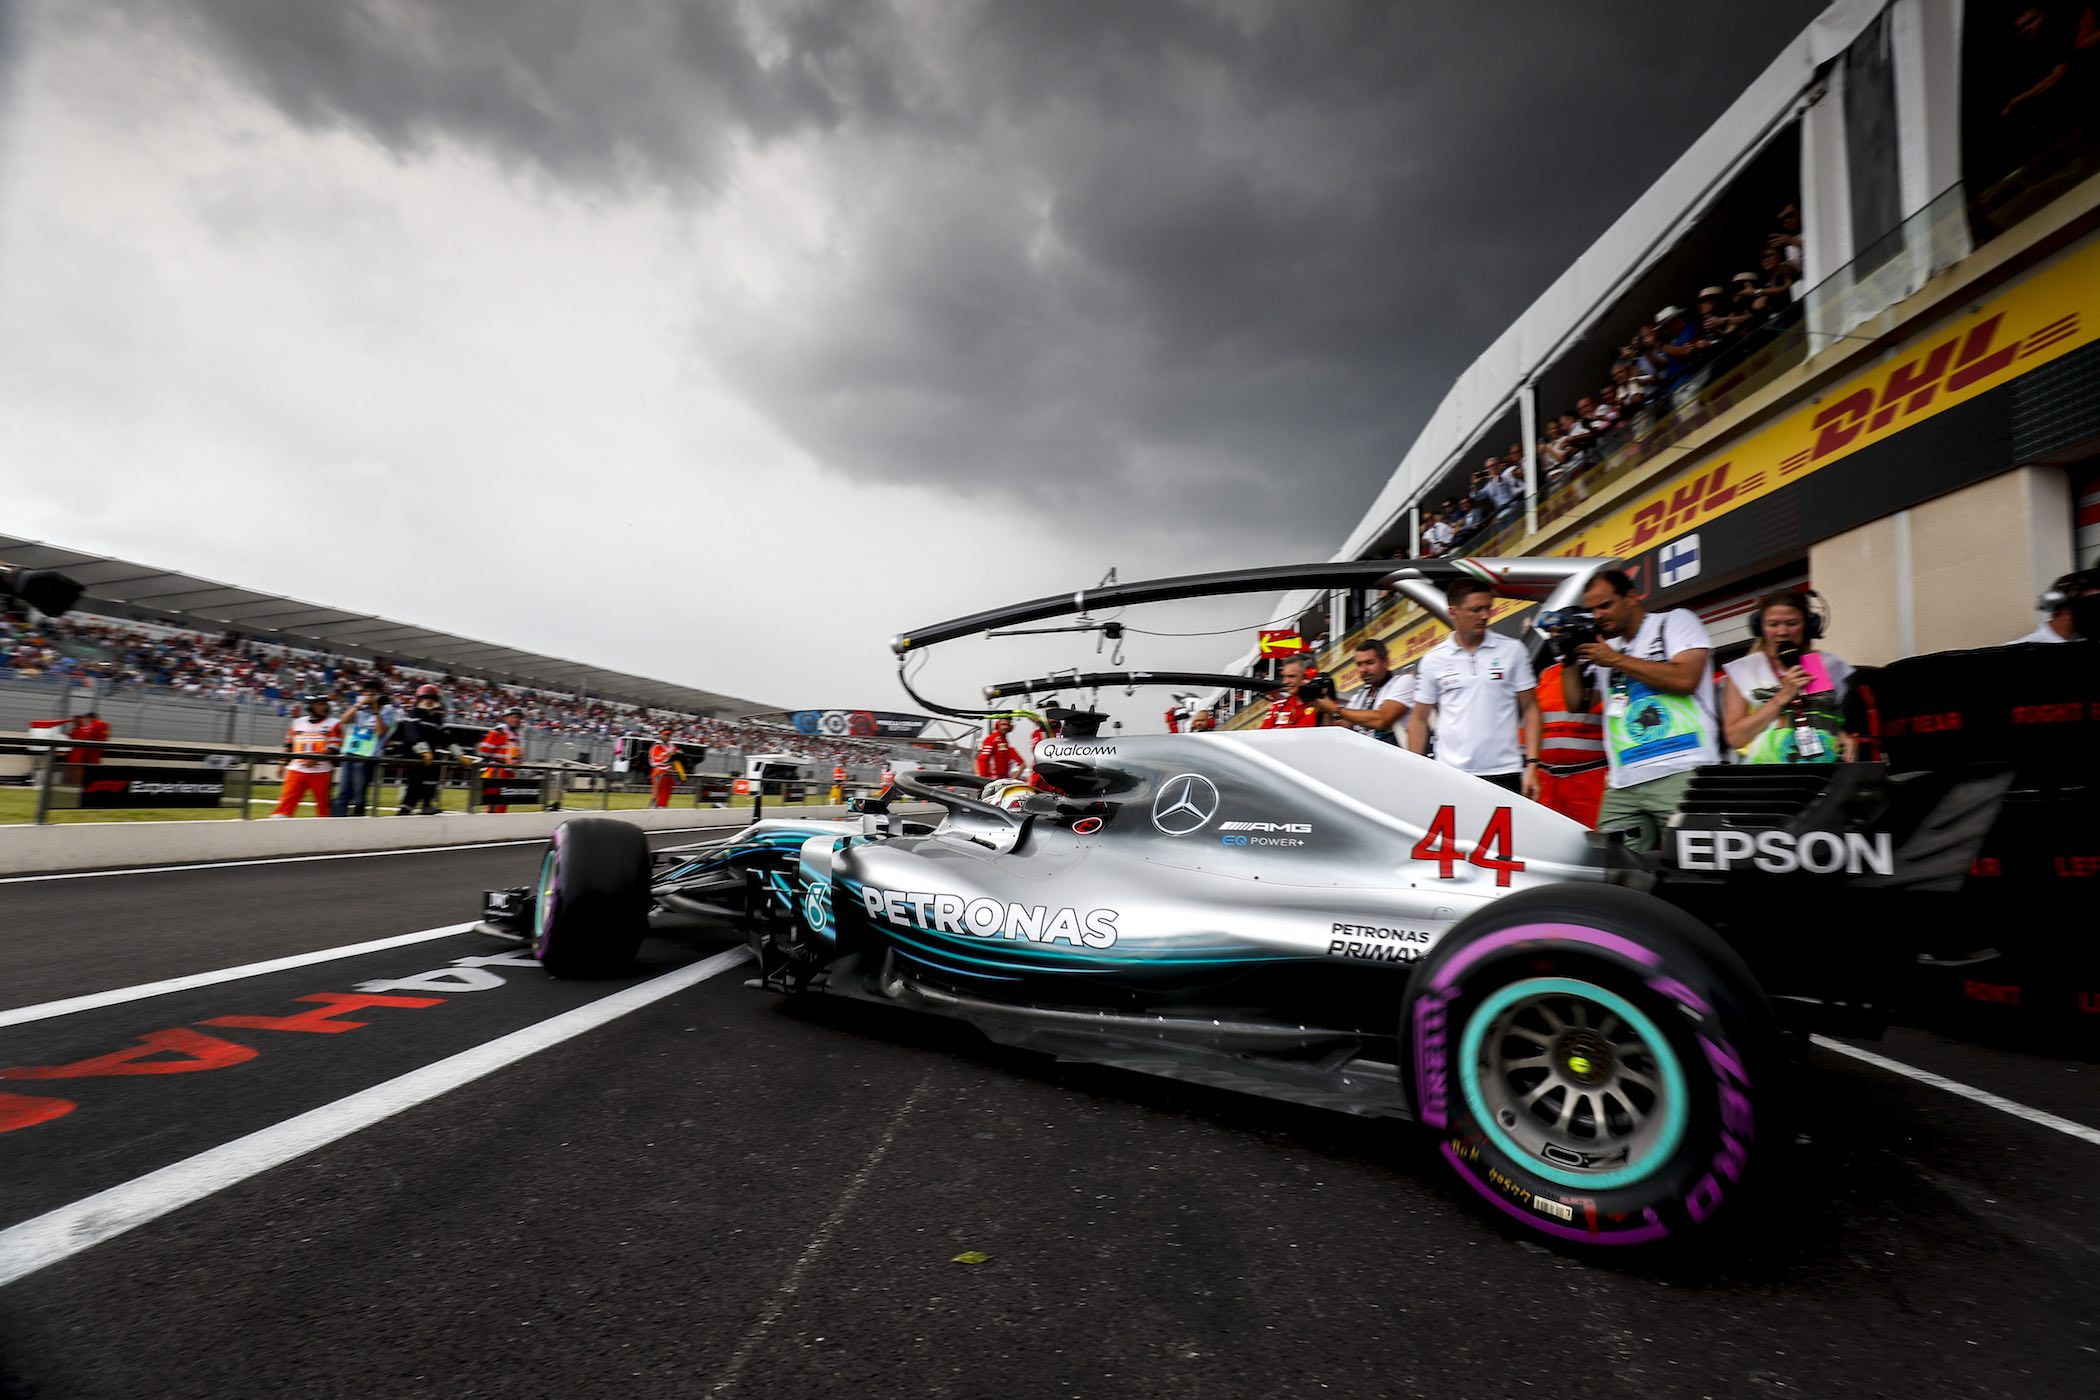 2018 French Grand Prix, Saturday - Wolfgang Wilhelm